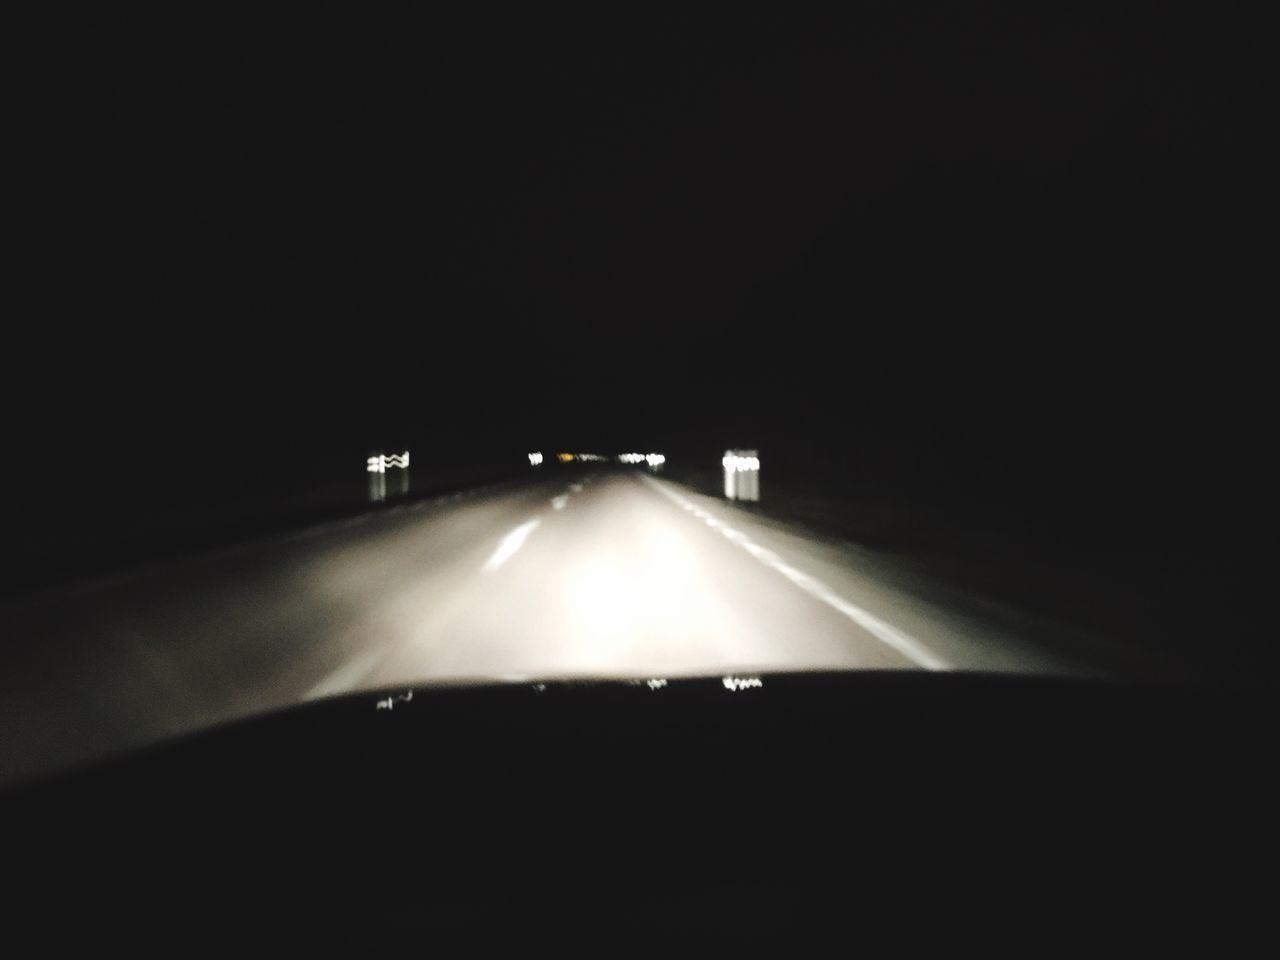 transportation, car, vehicle interior, dark, illuminated, car interior, windshield, car point of view, journey, night, land vehicle, mode of transport, no people, road